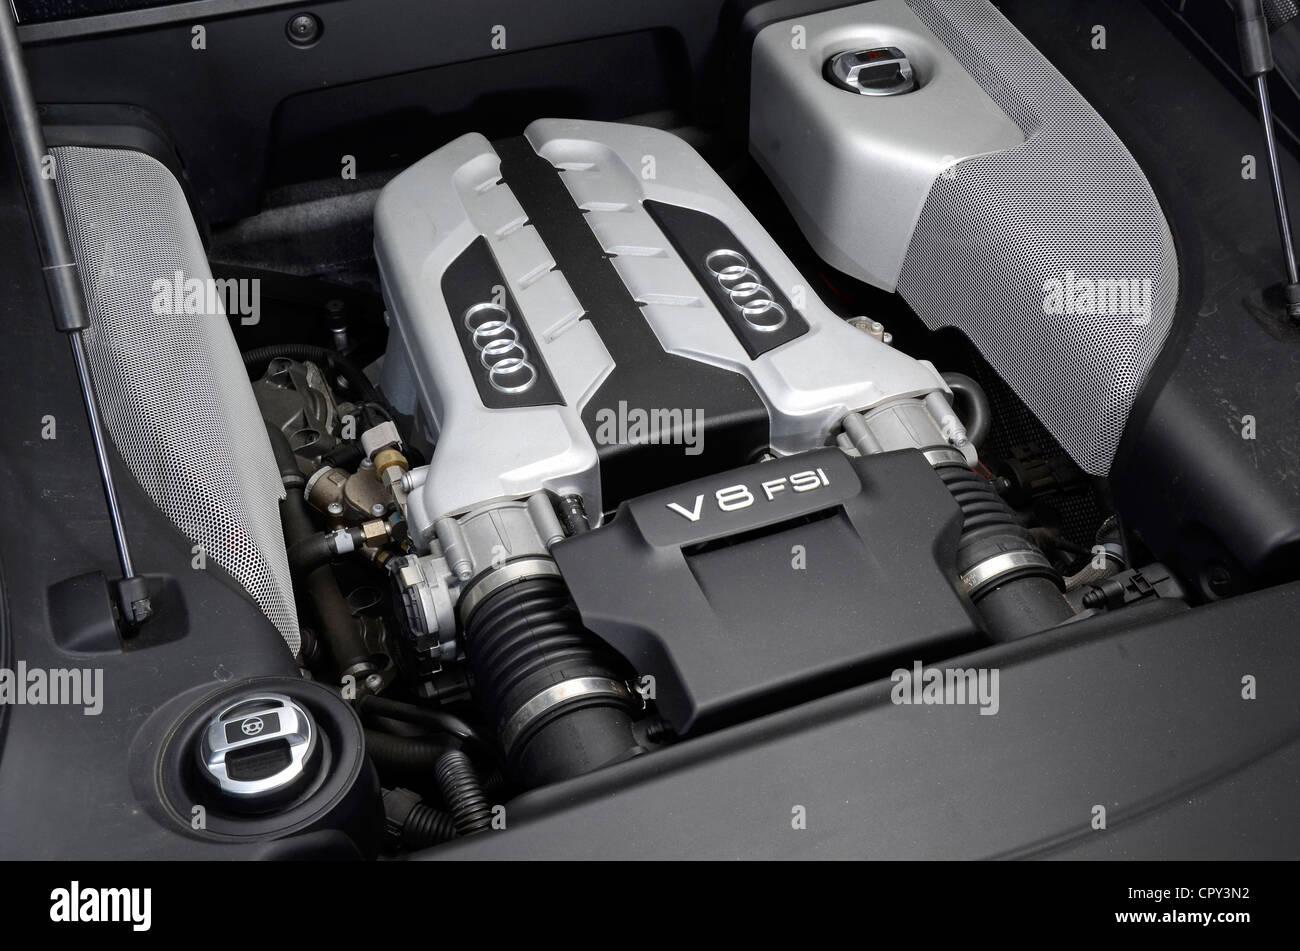 Audi R Engine Stock Photos Audi R Engine Stock Images Alamy - Audi r8 engine